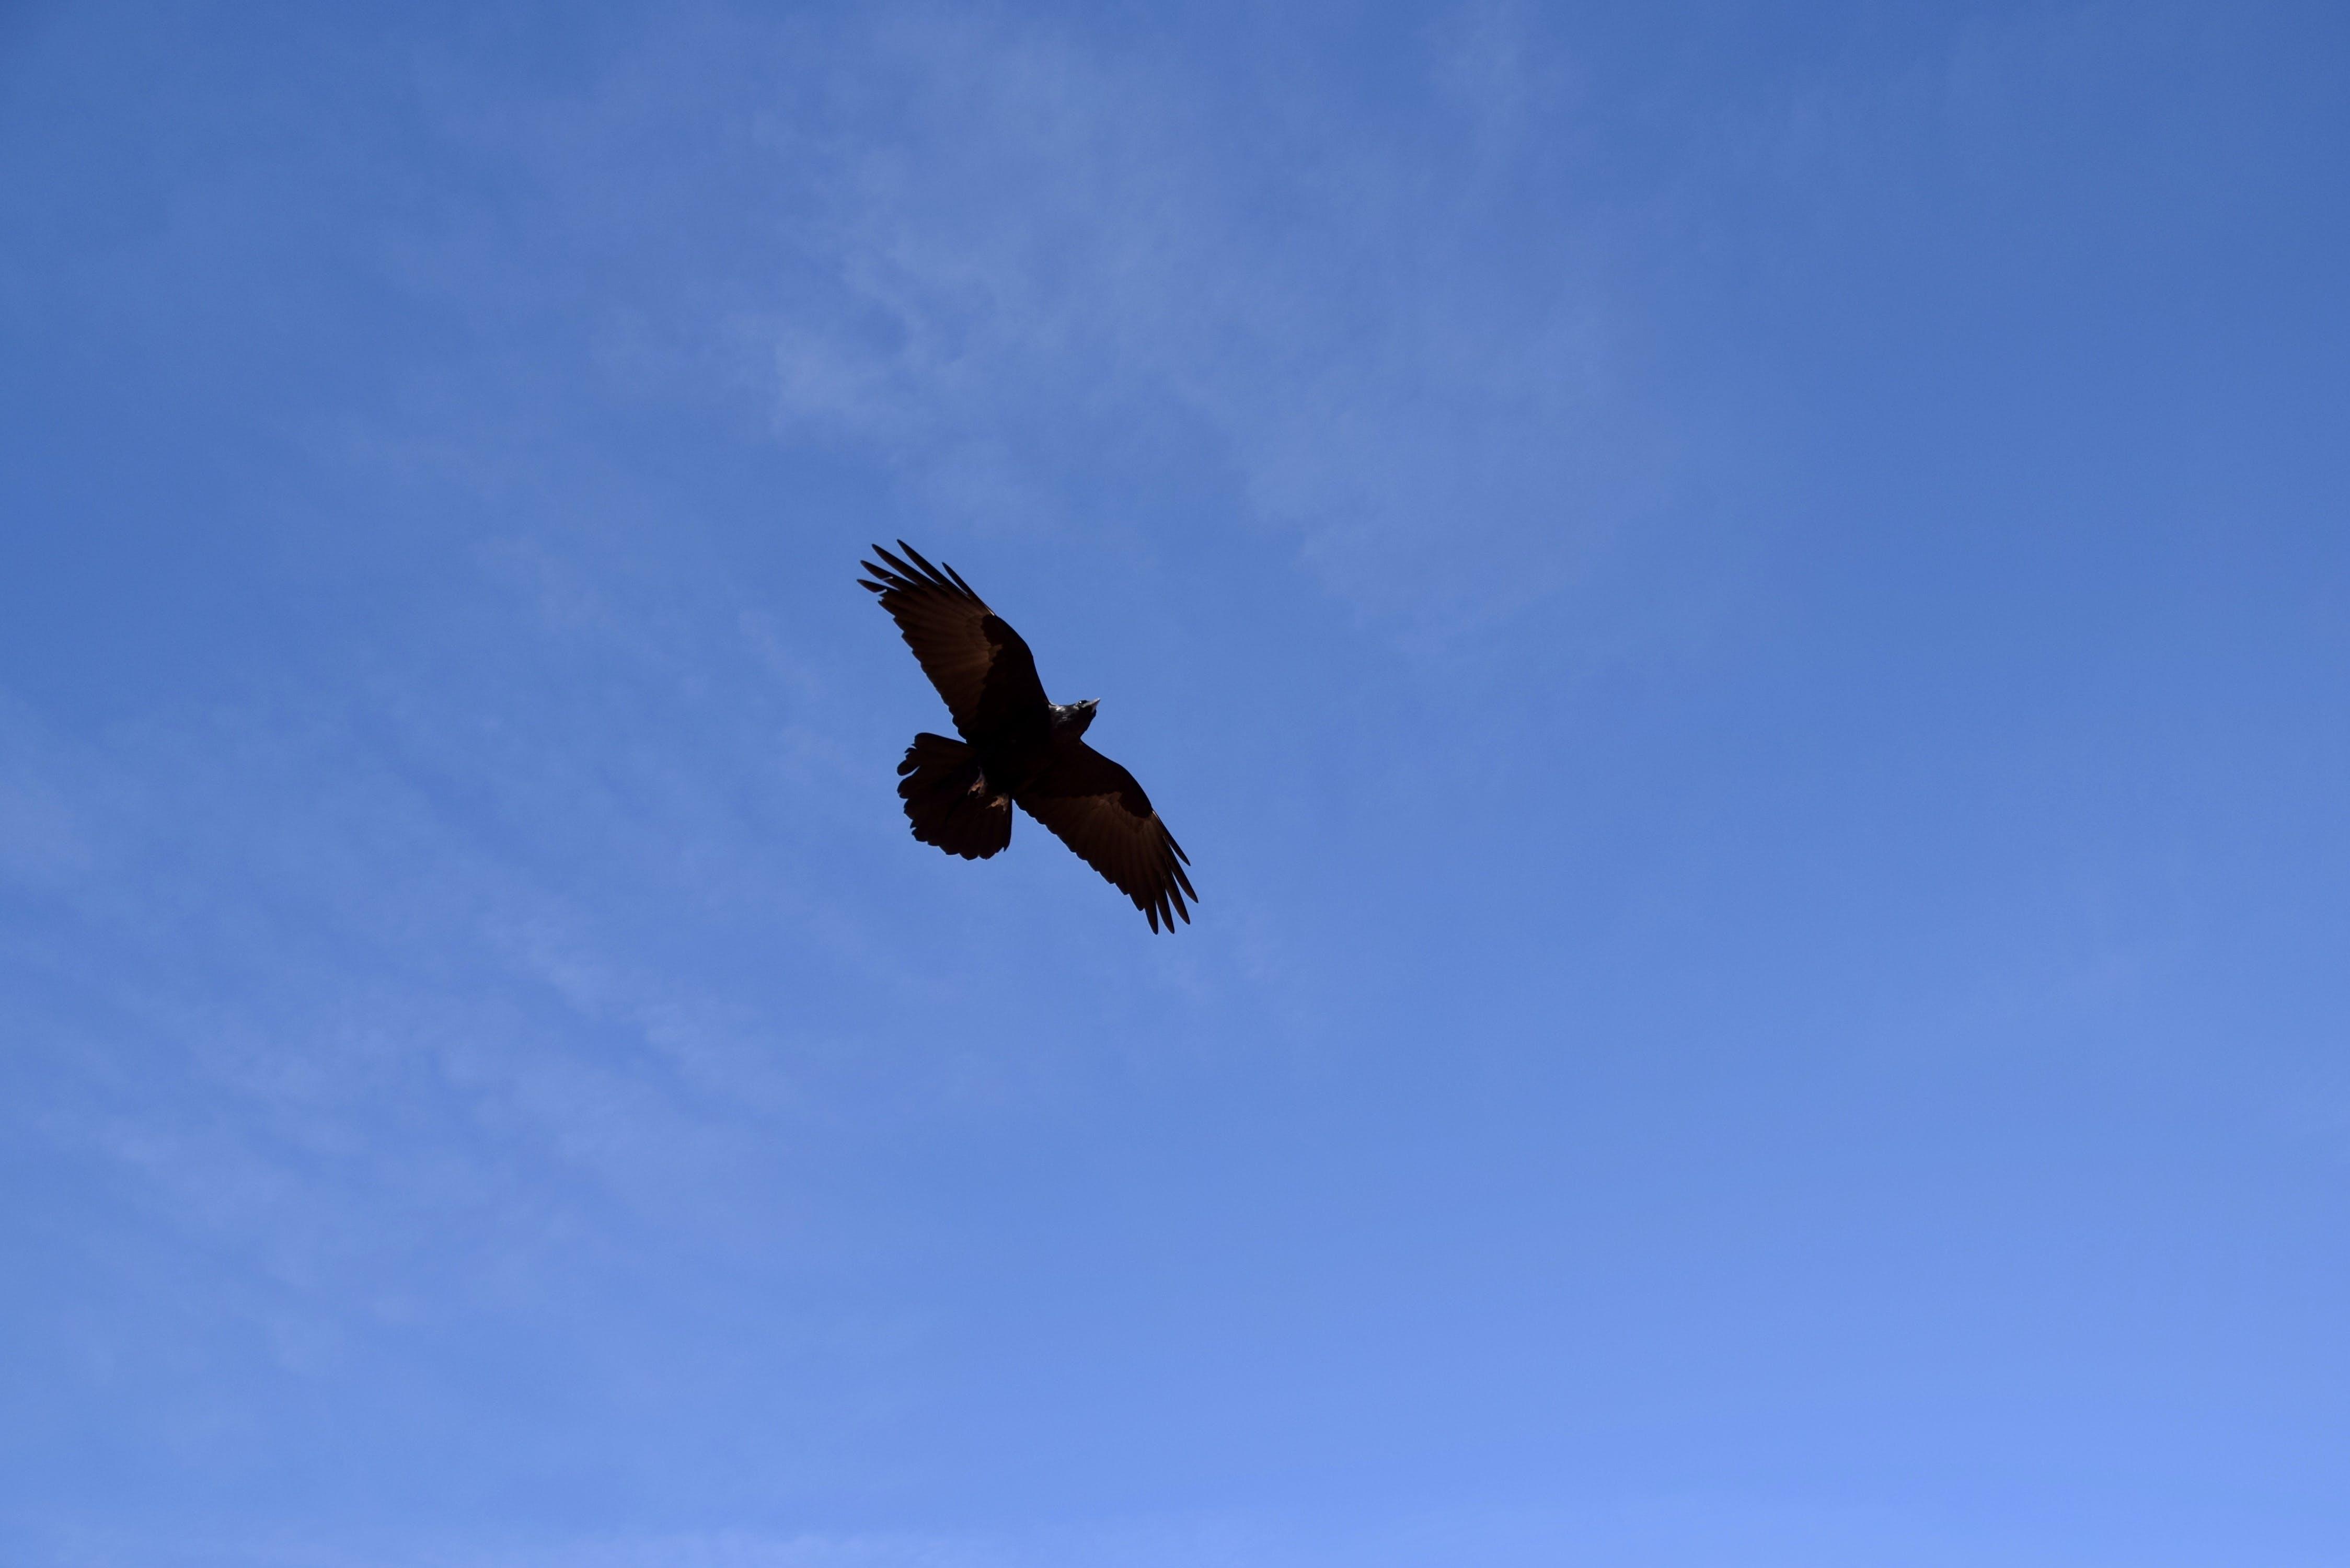 Free stock photo of sky, bird, clouds, black